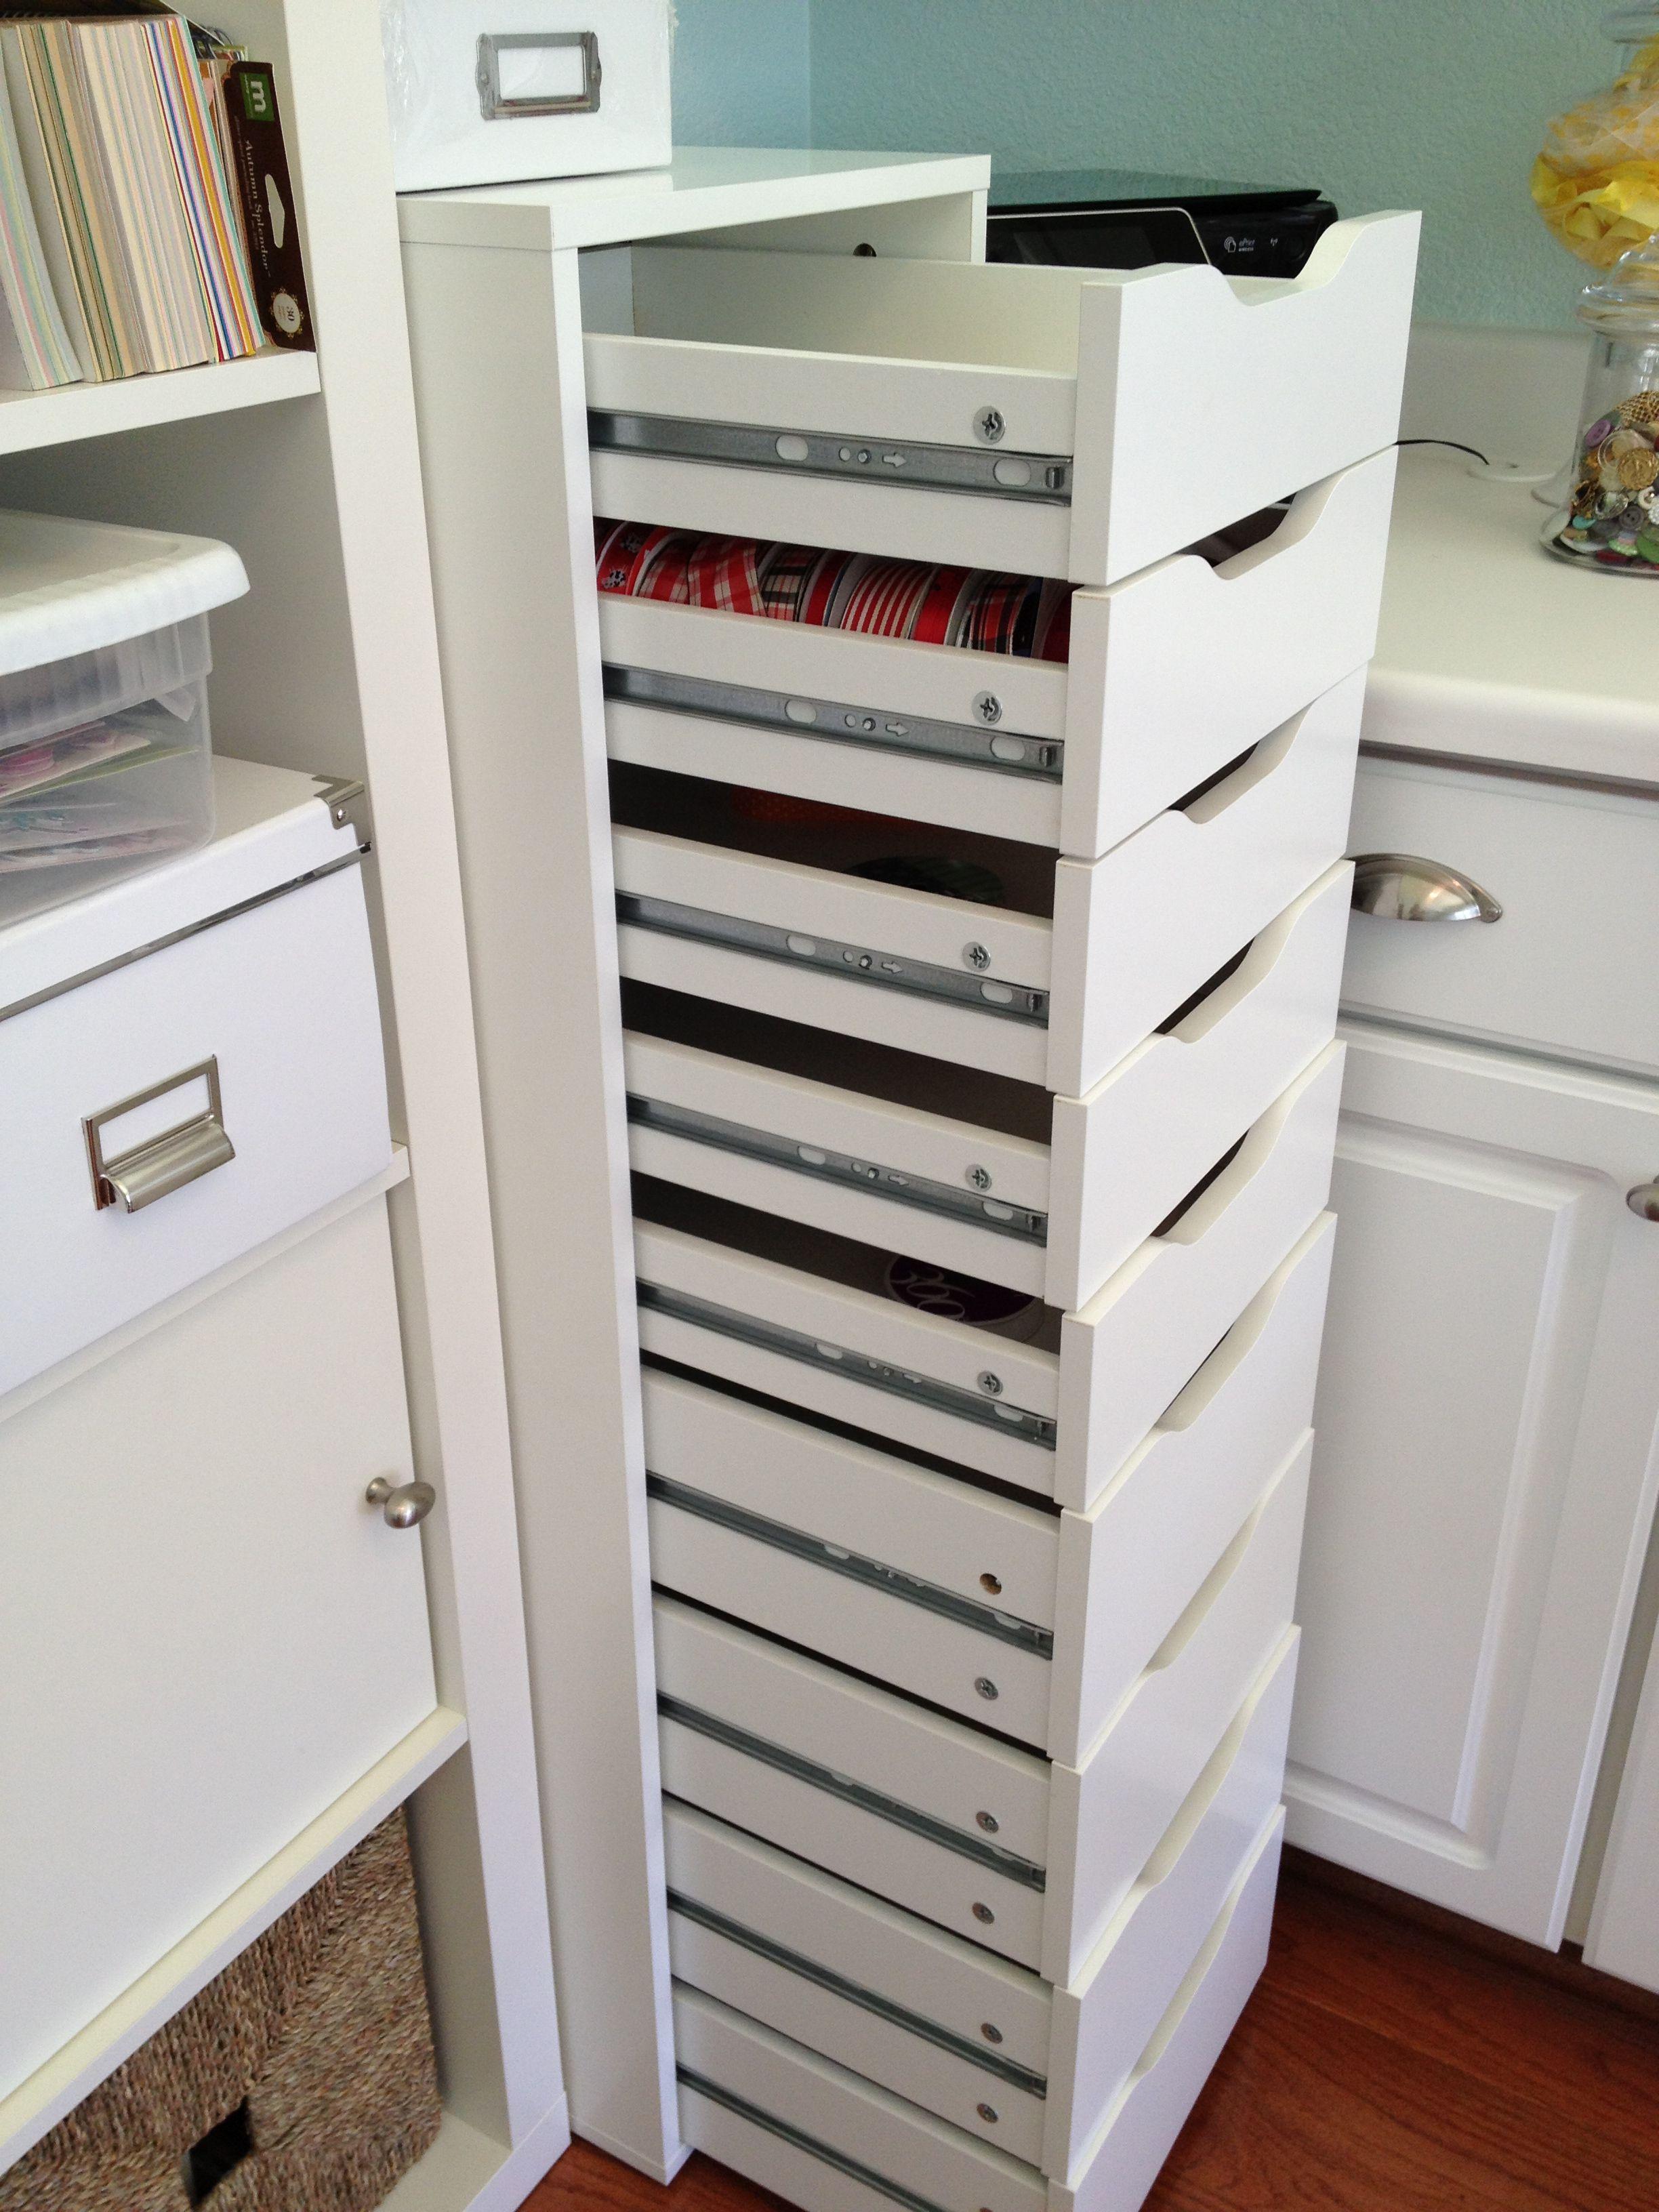 Epingle Par Linda Stucker Sur My Craft Room Meuble Rangement Bureau Meuble Rangement Scrapbooking Rangement